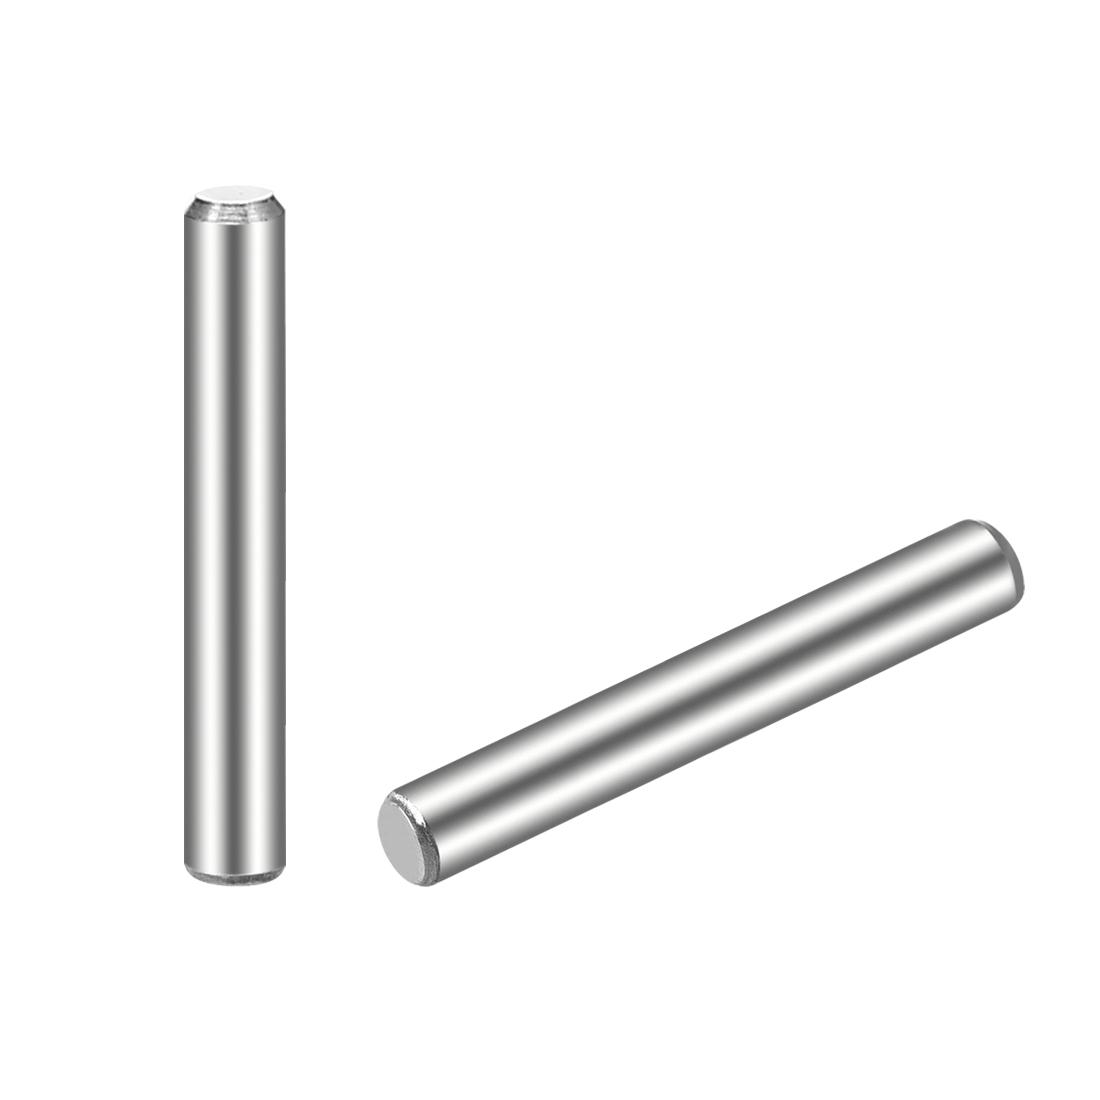 100Pcs 3mm x 20mm Dowel Pin 304 Stainless Steel Shelf Support Pin Fasten